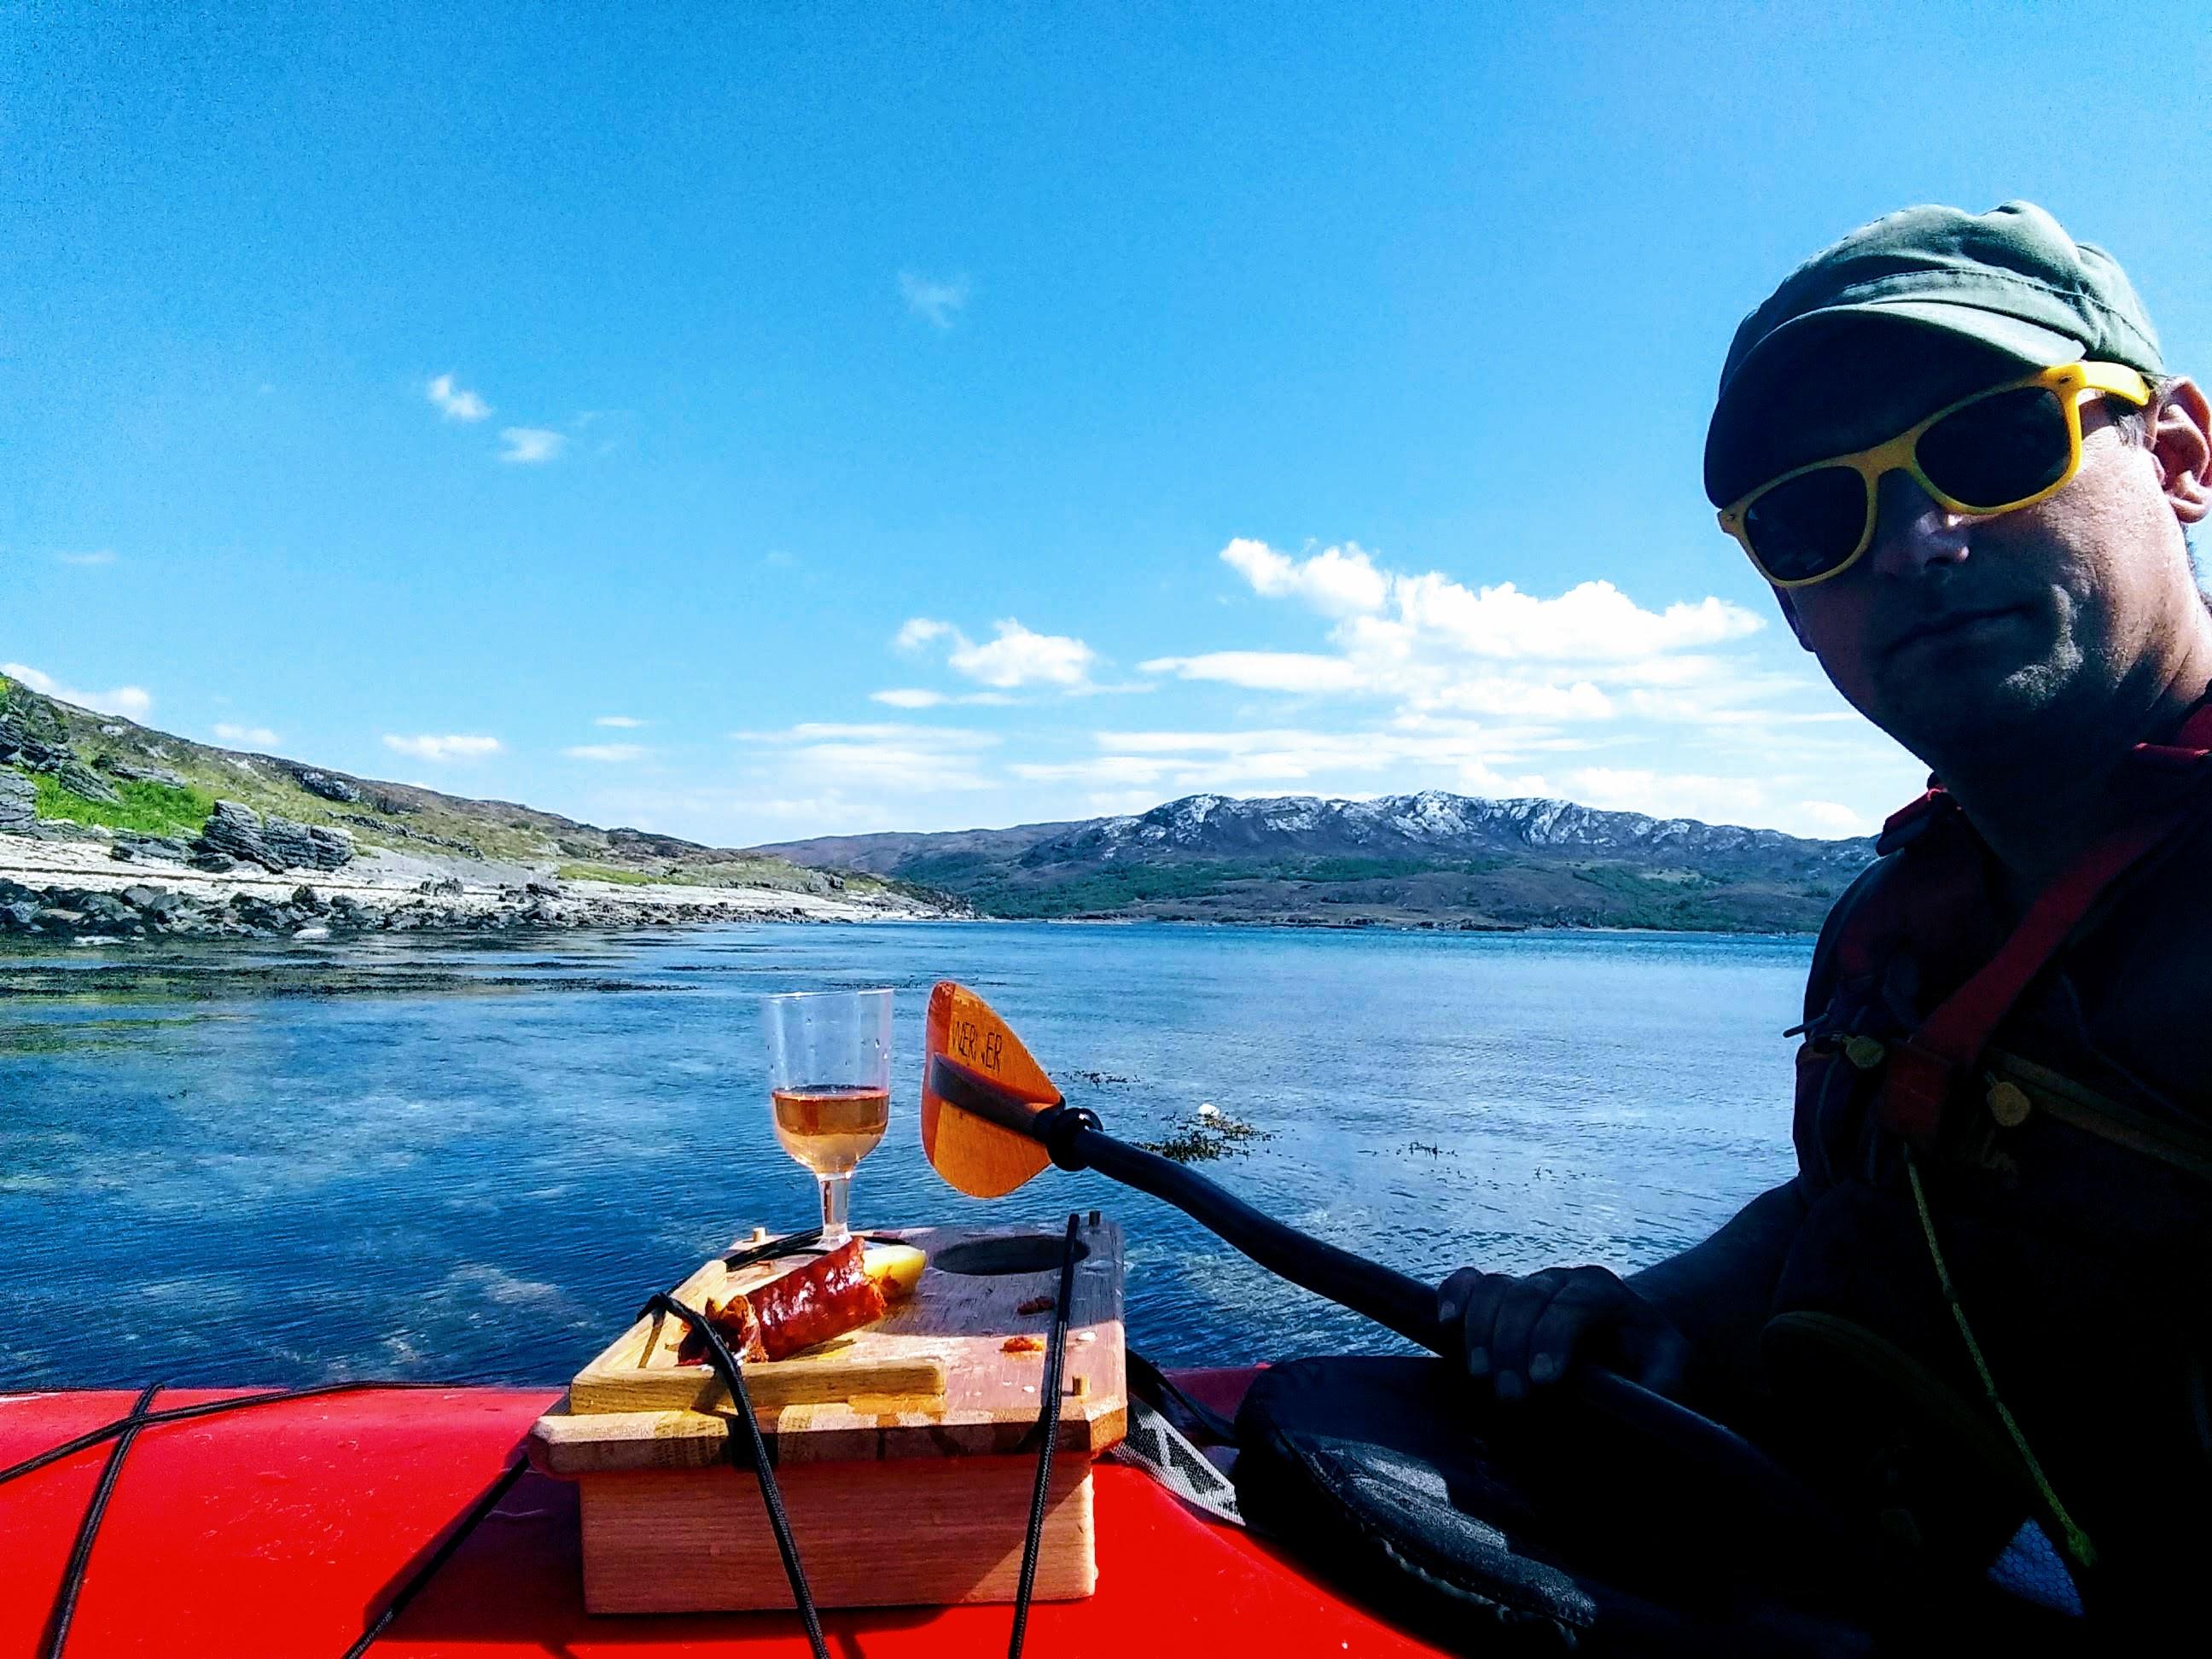 Dining kayaking - Outdoor Explore